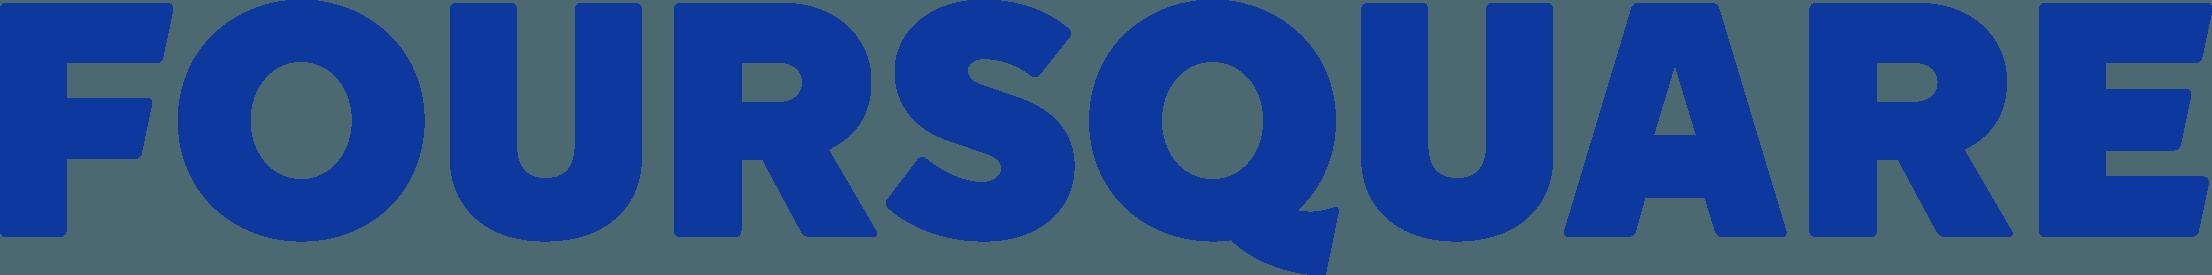 Foursquare Logo png